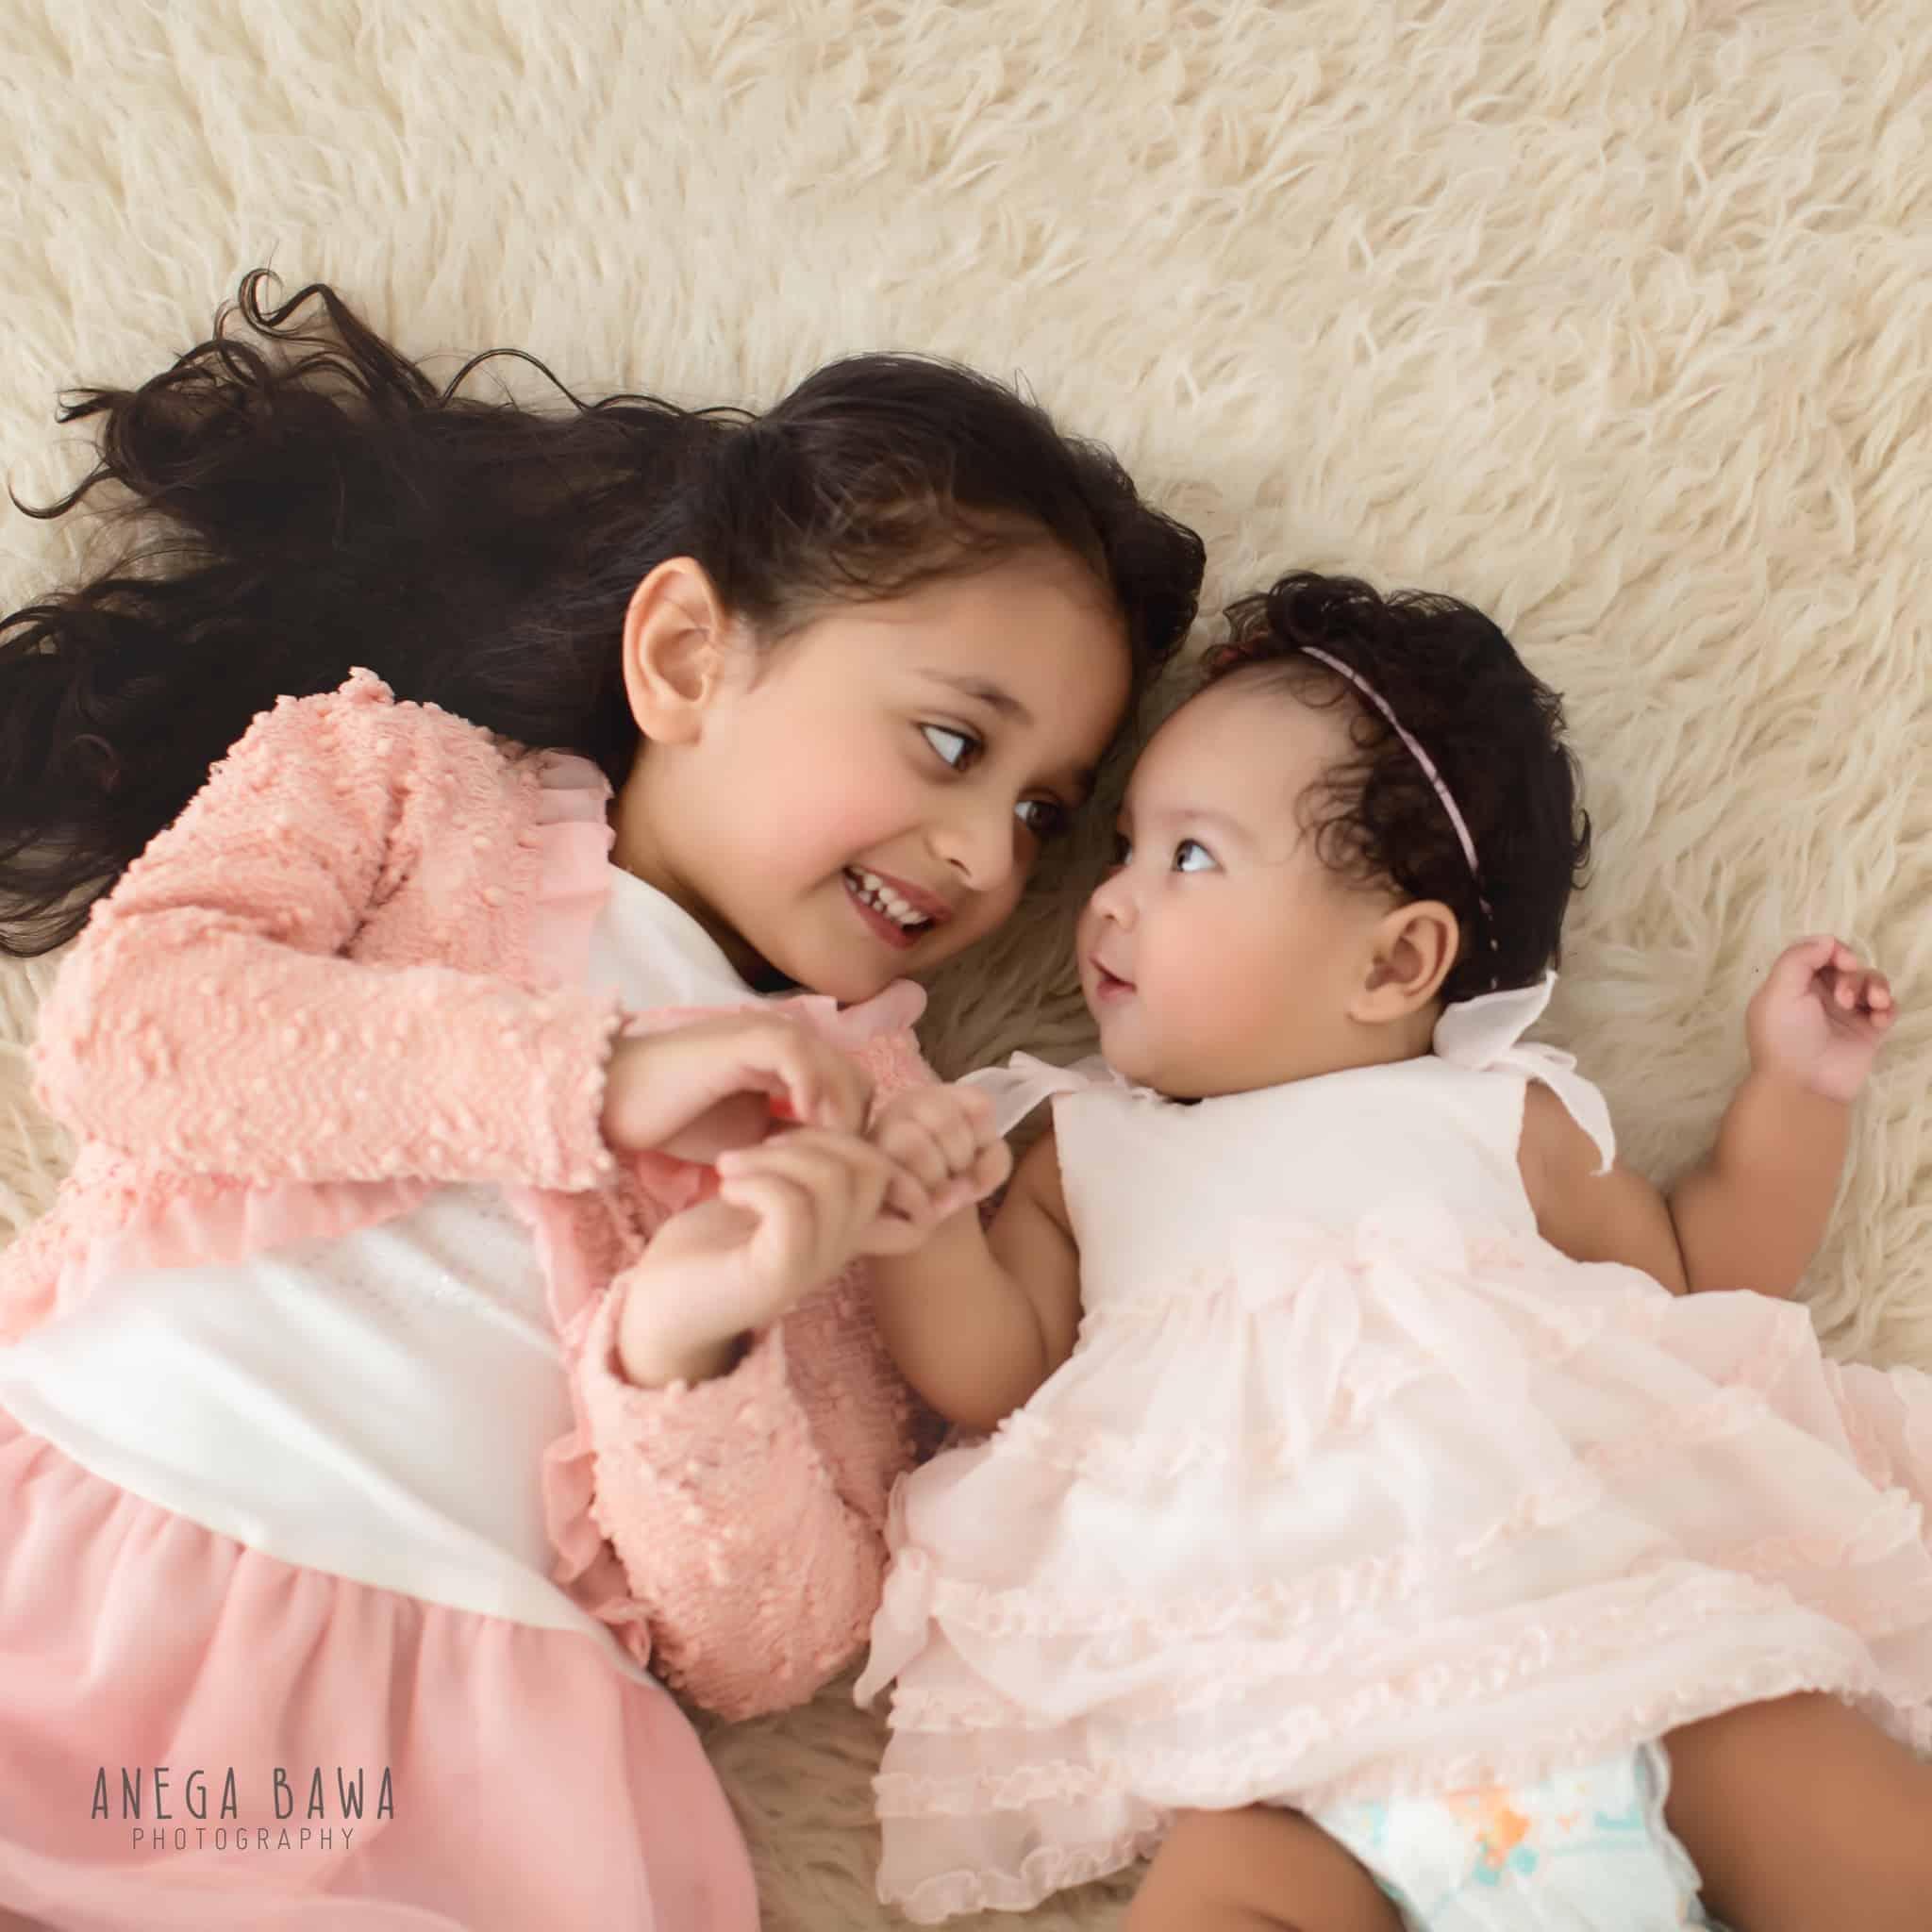 002_baby_photography_delhi_gurgaon_noida_anega_bawa_photography